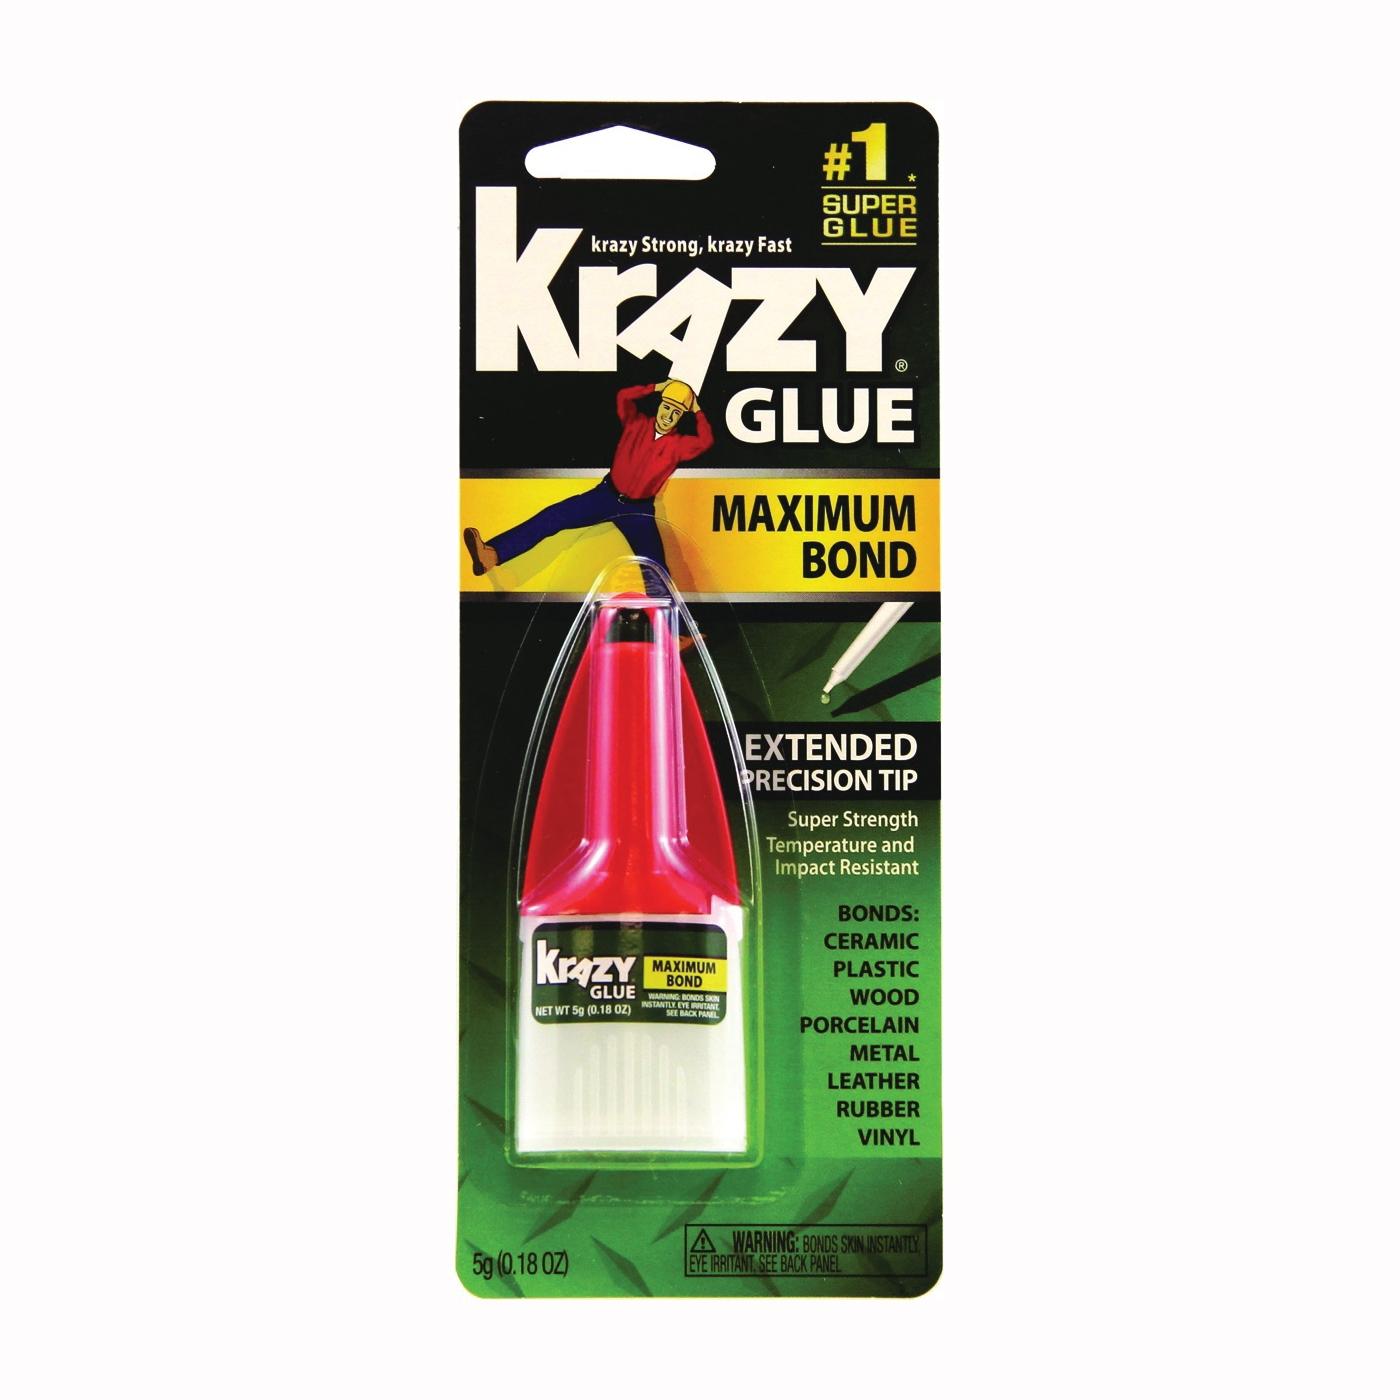 Picture of Krazy Glue Advanced Formula KG48348MR Maximum Bond Glue, Liquid, Irritating, Clear, 5 g Package, Bottle